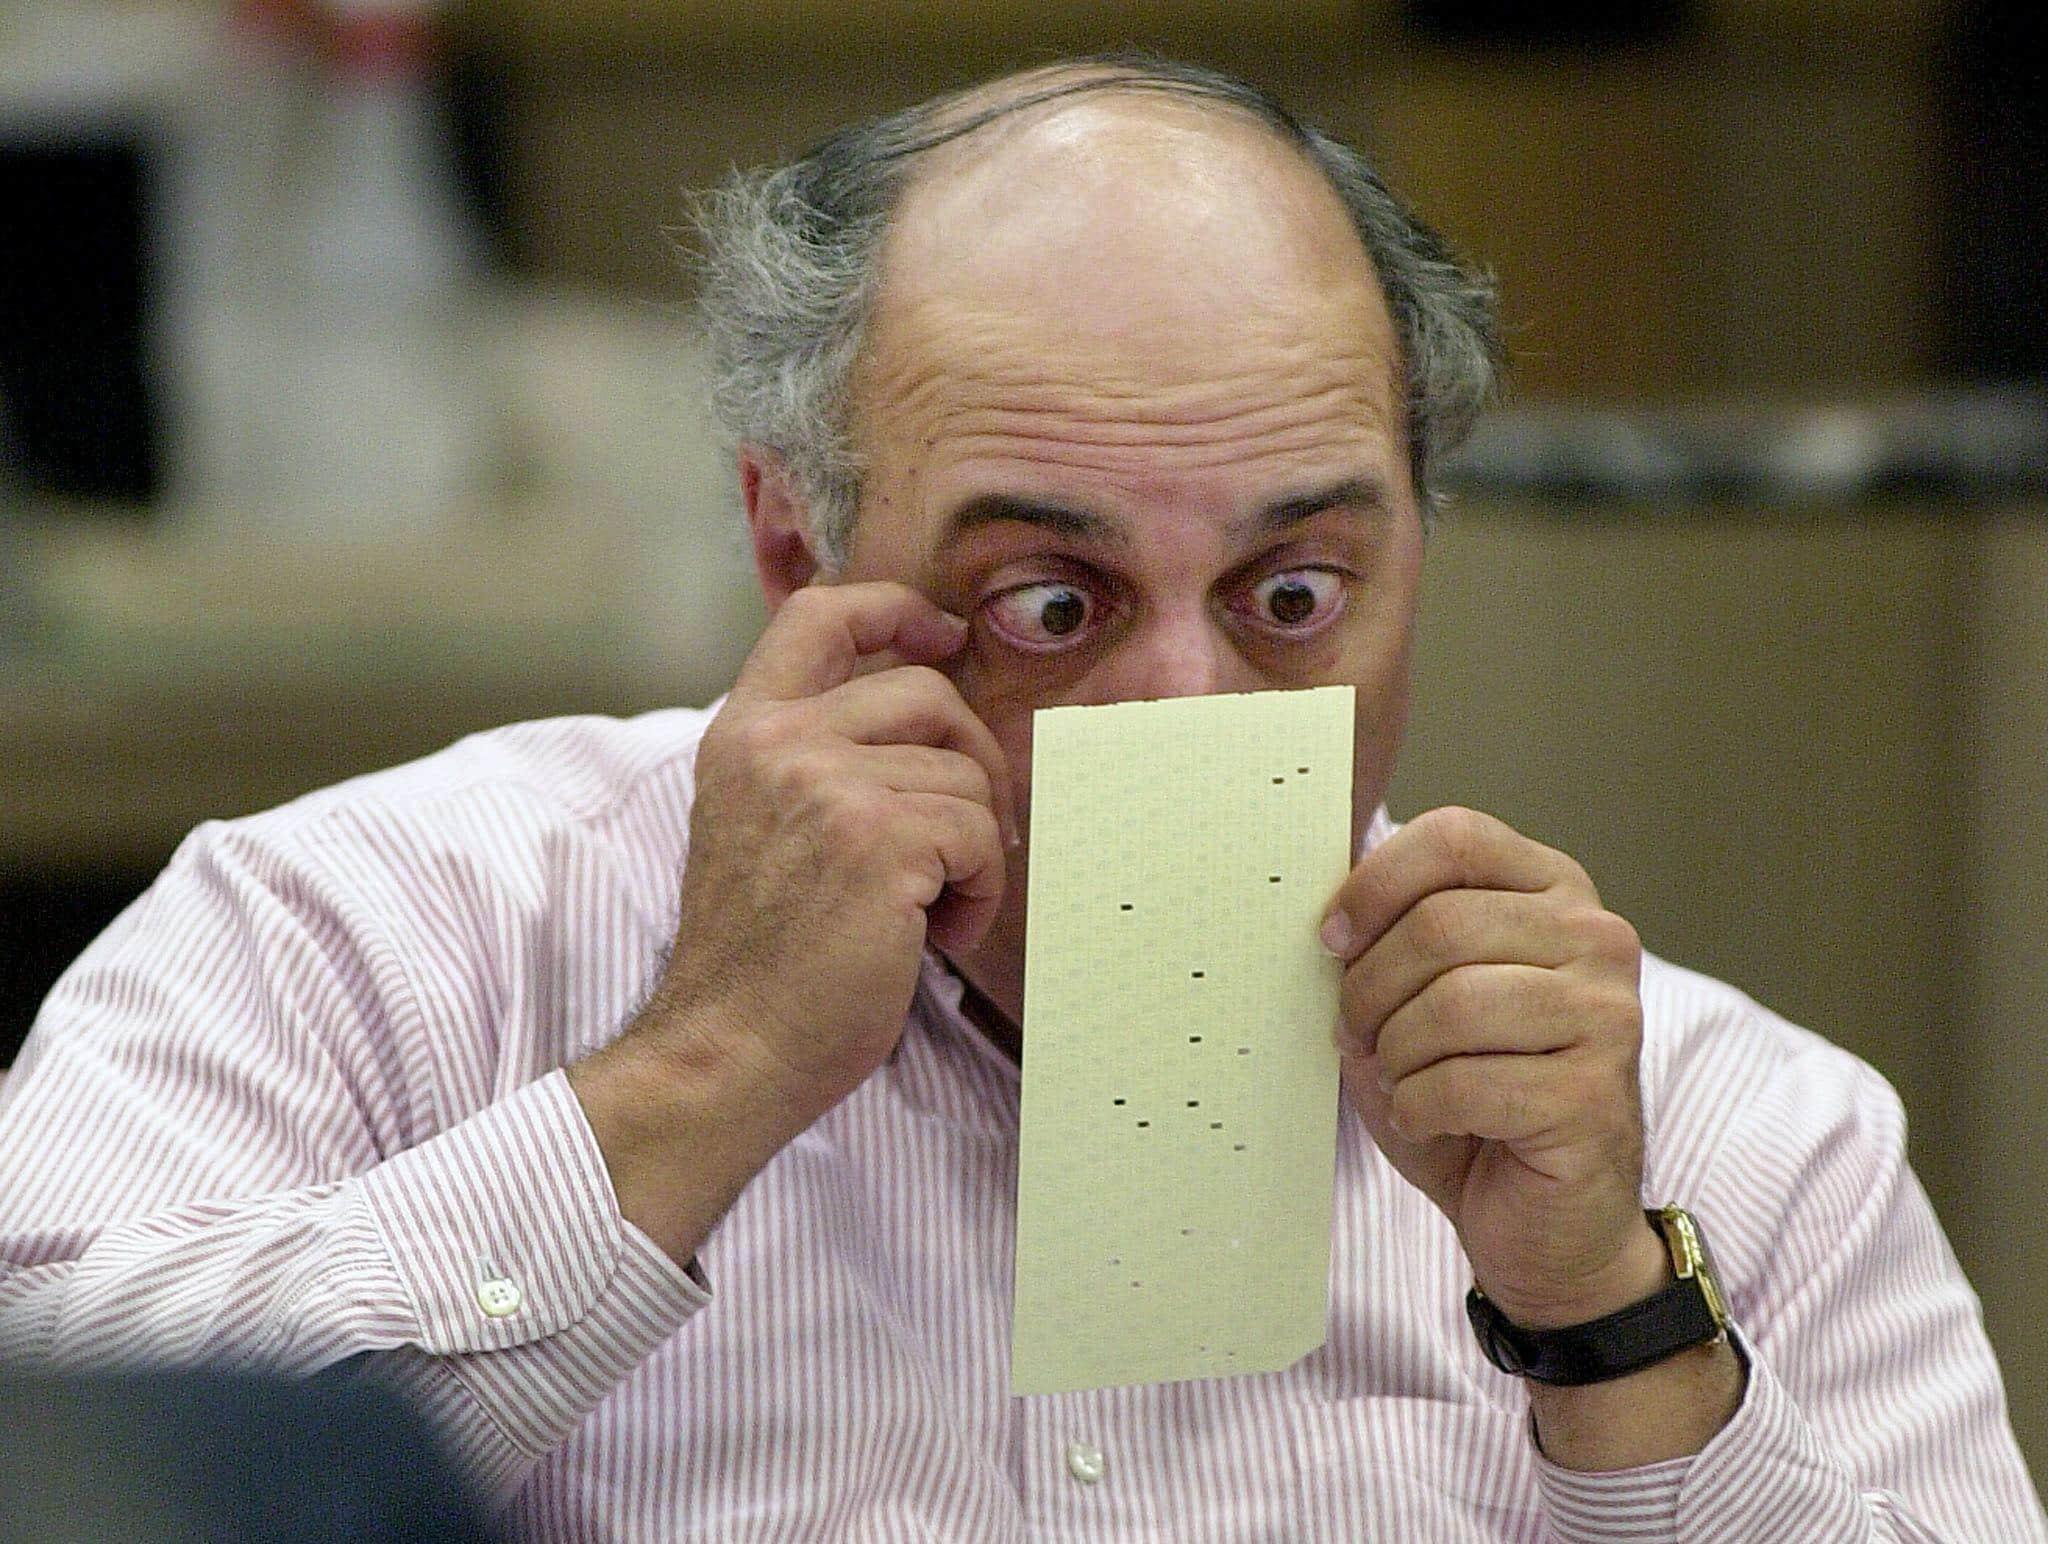 US election 2020 to feel like 2000?